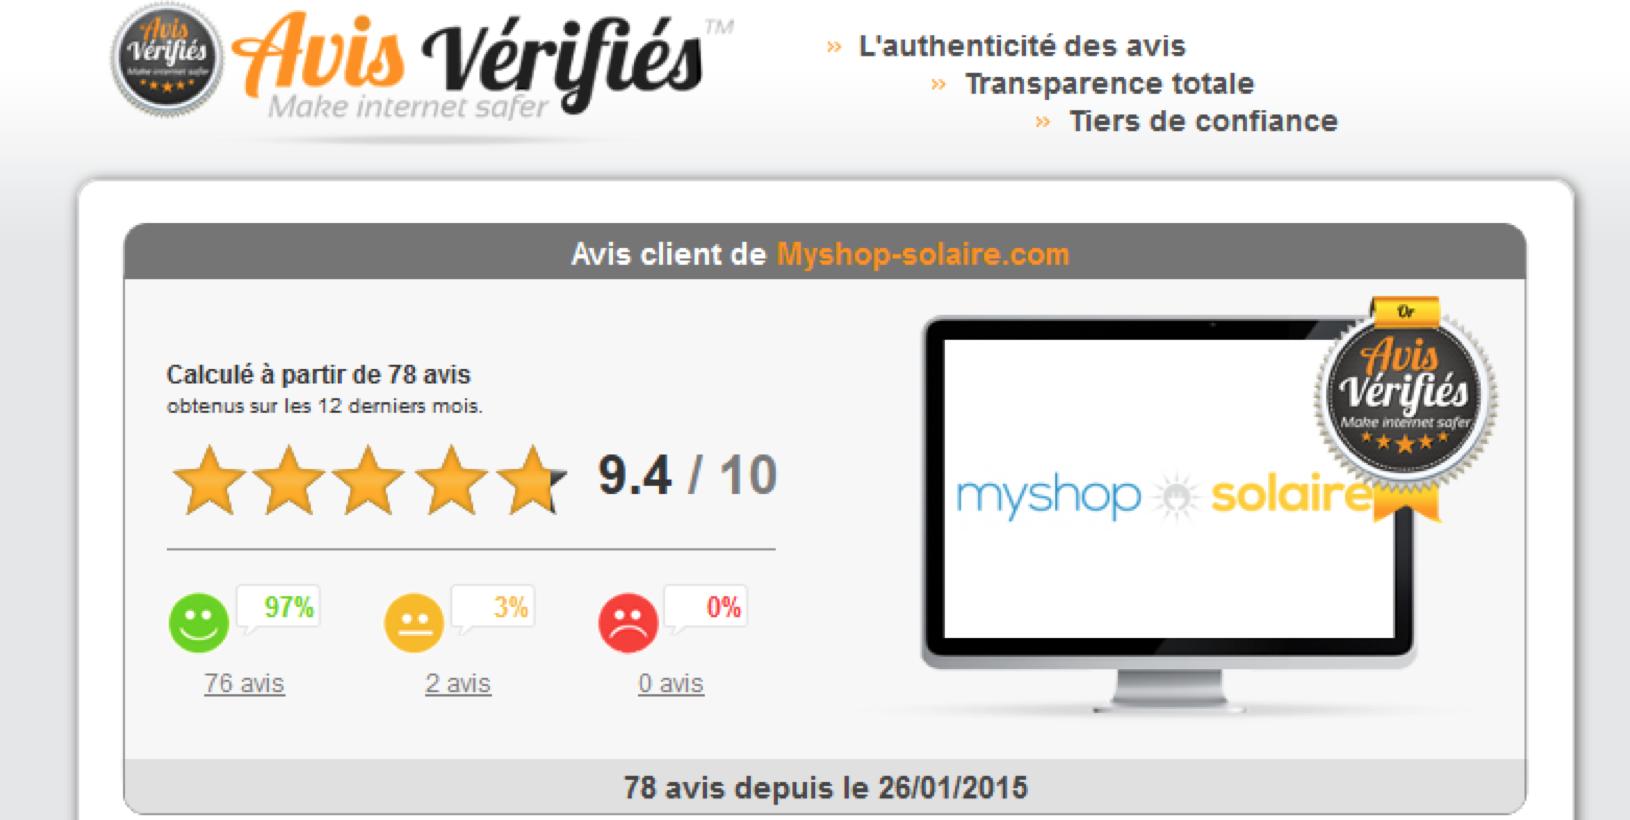 Screenshoot-Myshop-Solaire-avis-verifies